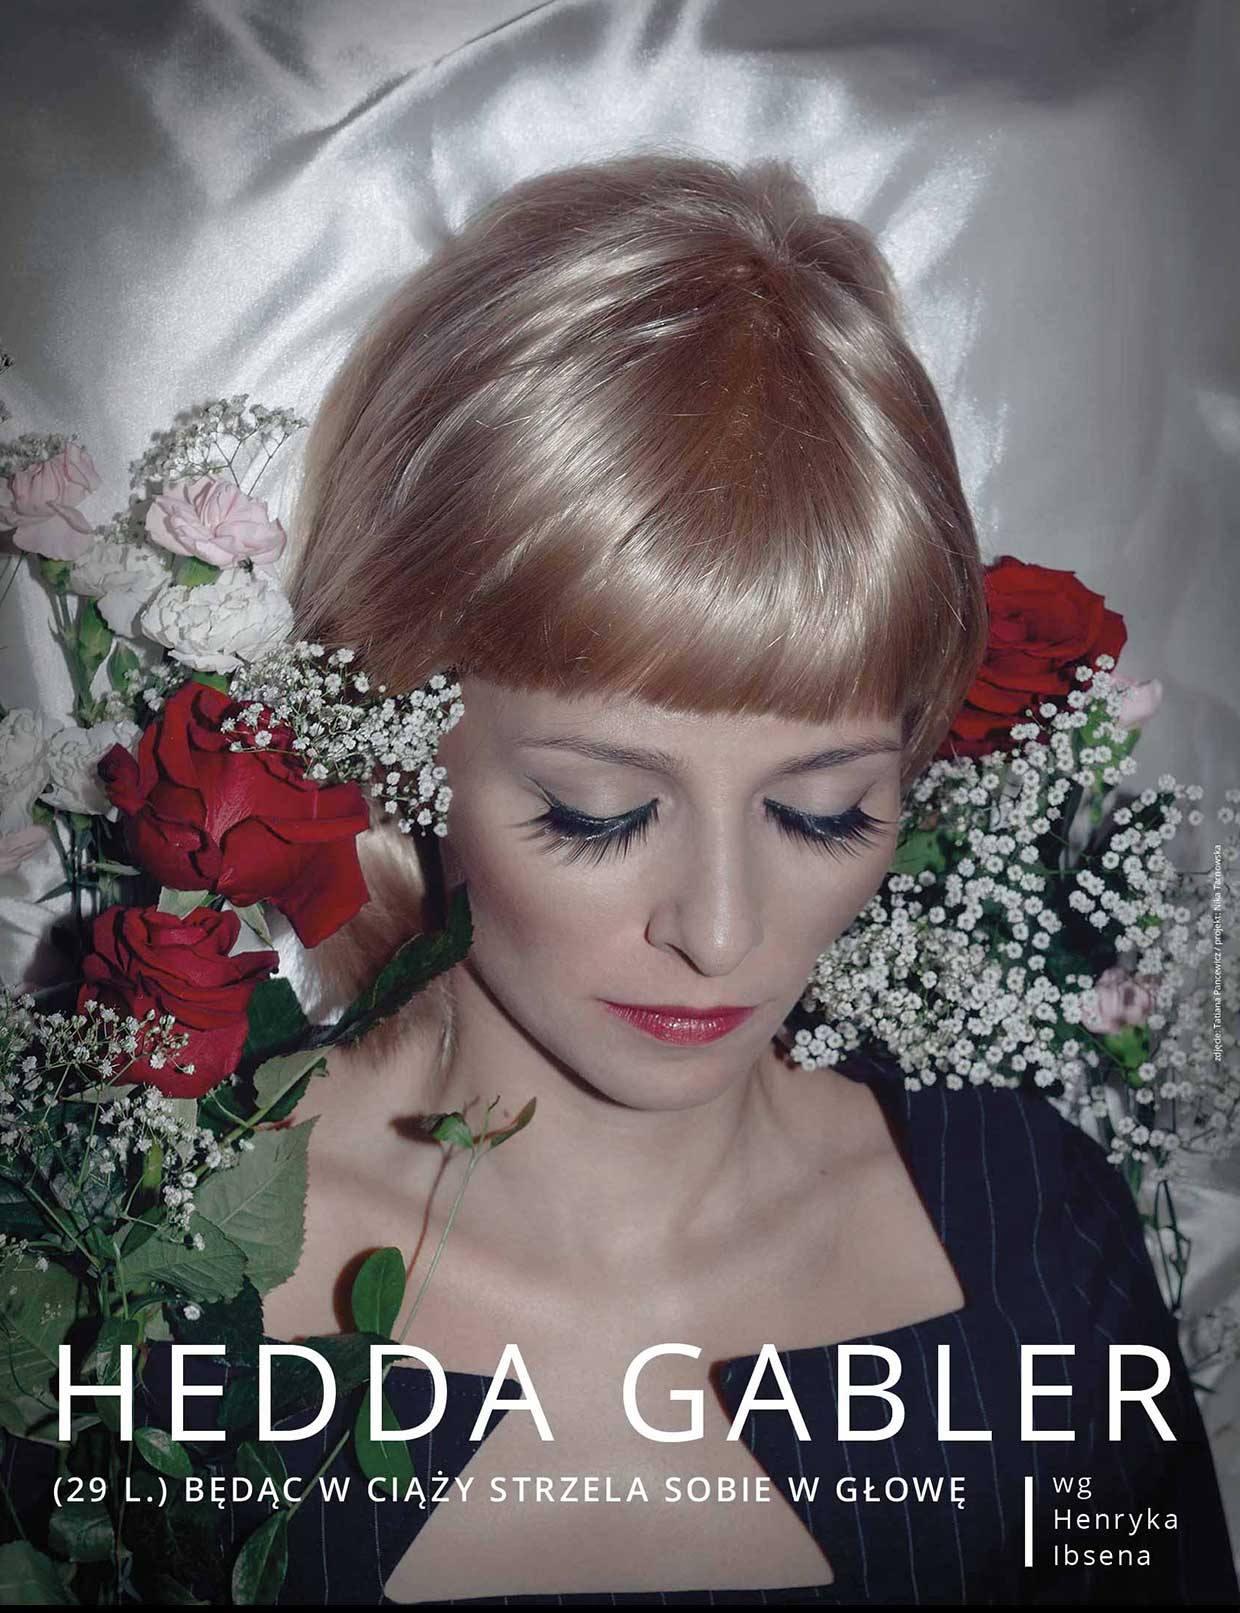 """Hedda Gabler"" – plakat (źródło: materiały prasowe organizatora)"